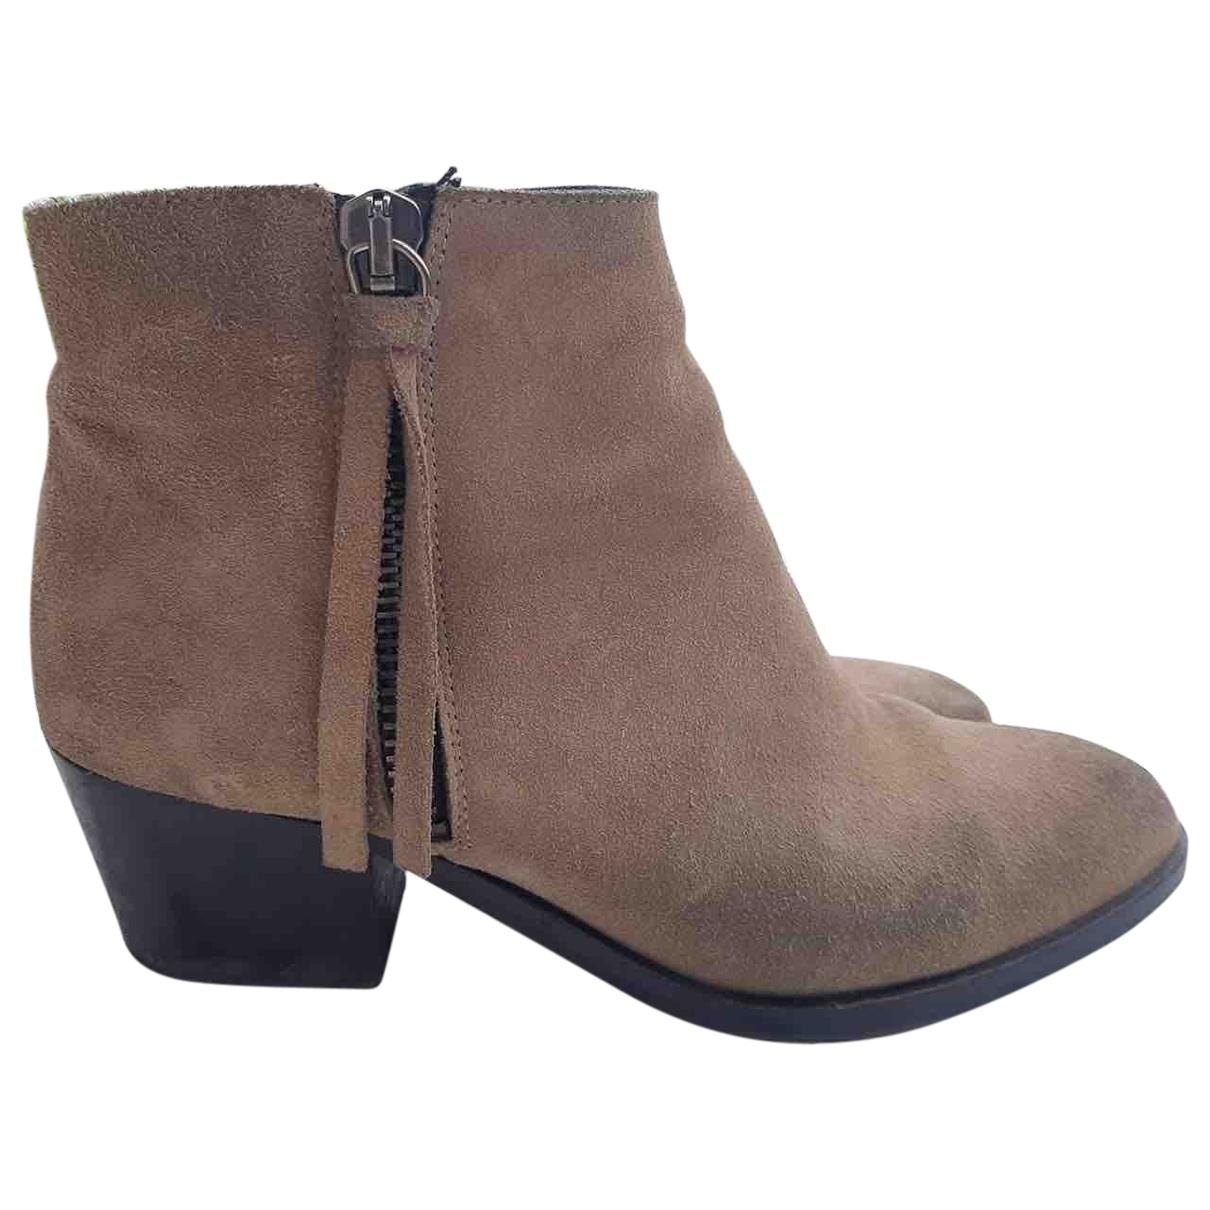 Bimba Y Lola - Boots   pour femme en suede - beige